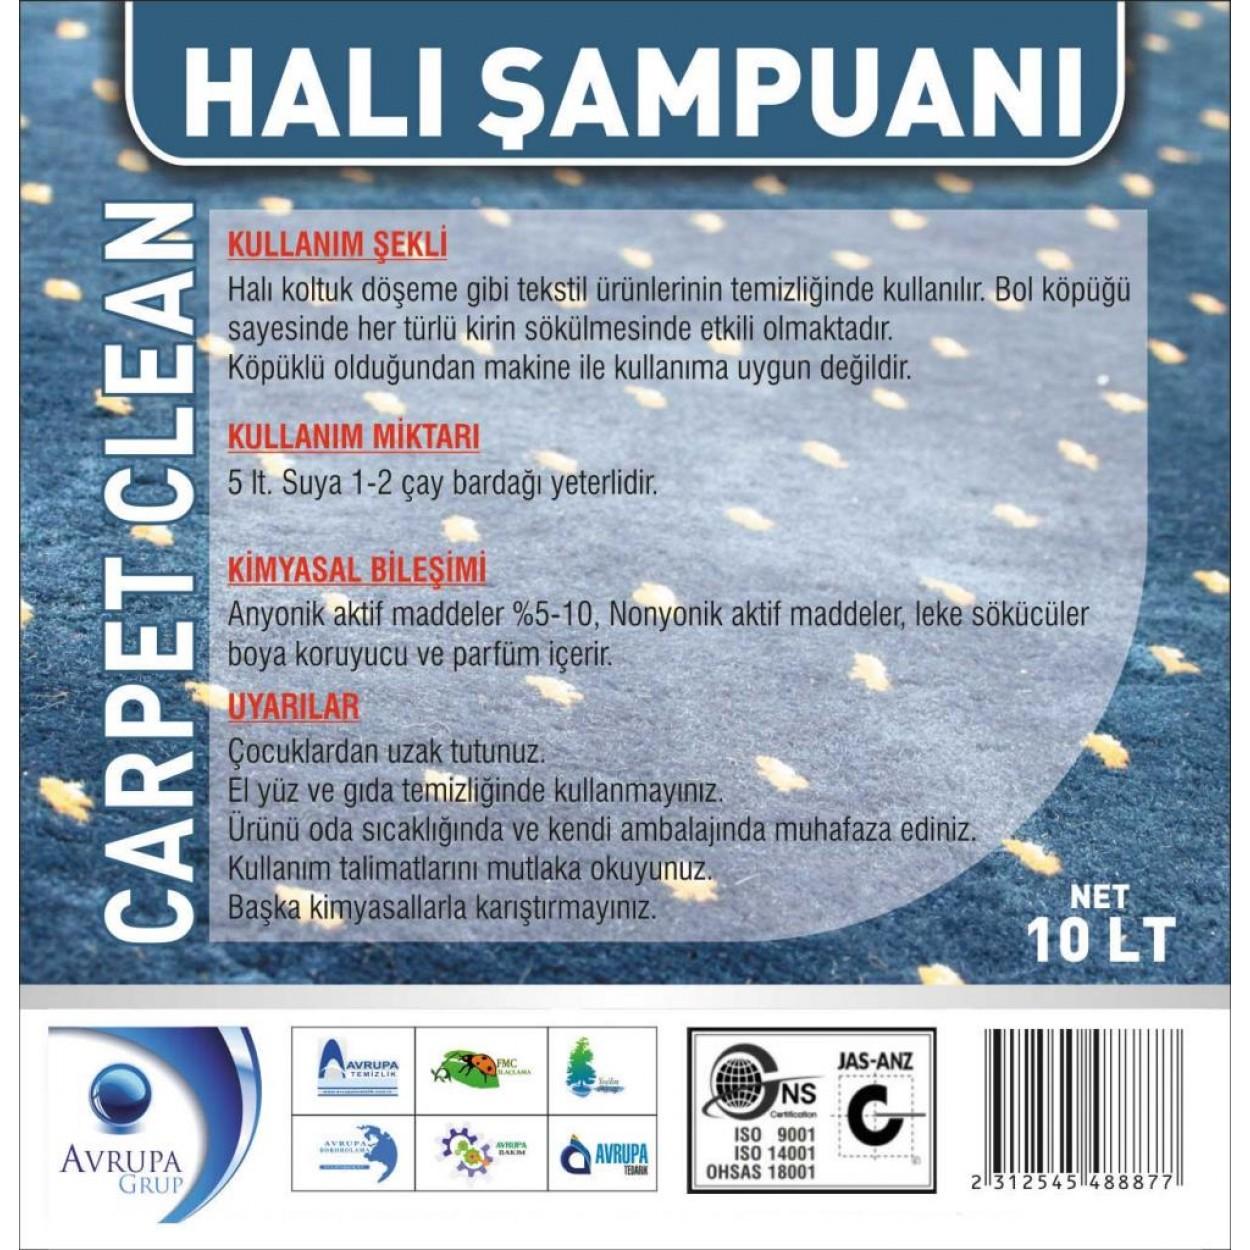 Carpet Clean Halı Şampuanı 10 Litre